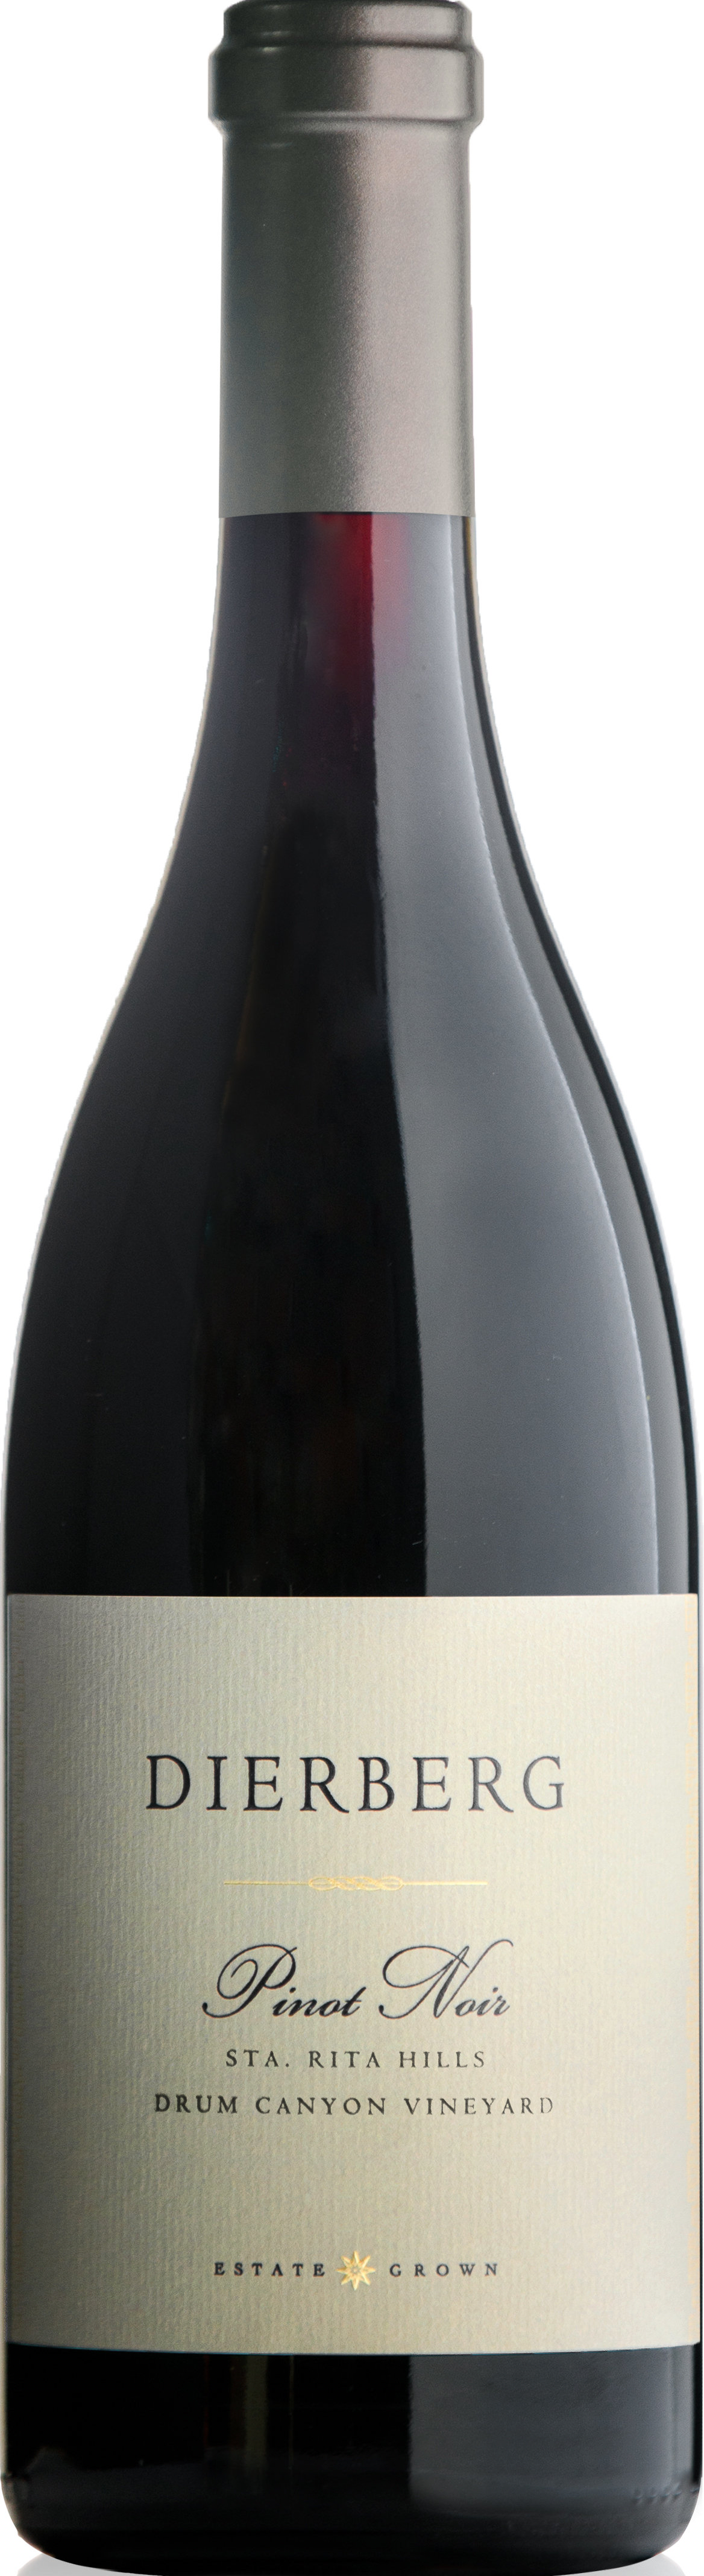 Dierberg - Pinot Noir, Santa Rita Hills